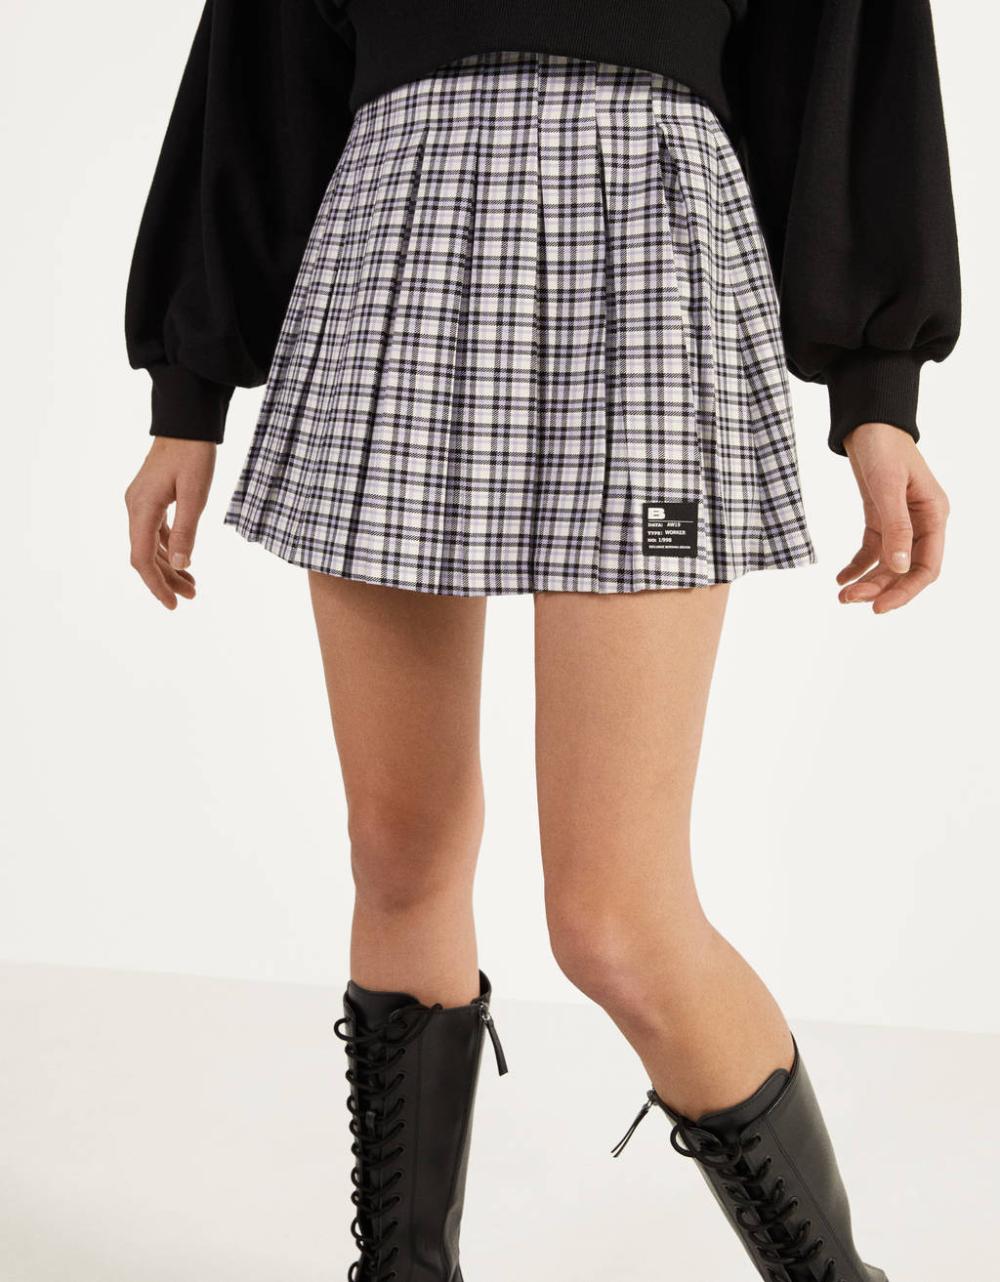 Pleated Mini Skirt Skirts Bershka United States In 2020 Mini Skirts Pleated Mini Skirt Pleated Mini Skirt Outfit